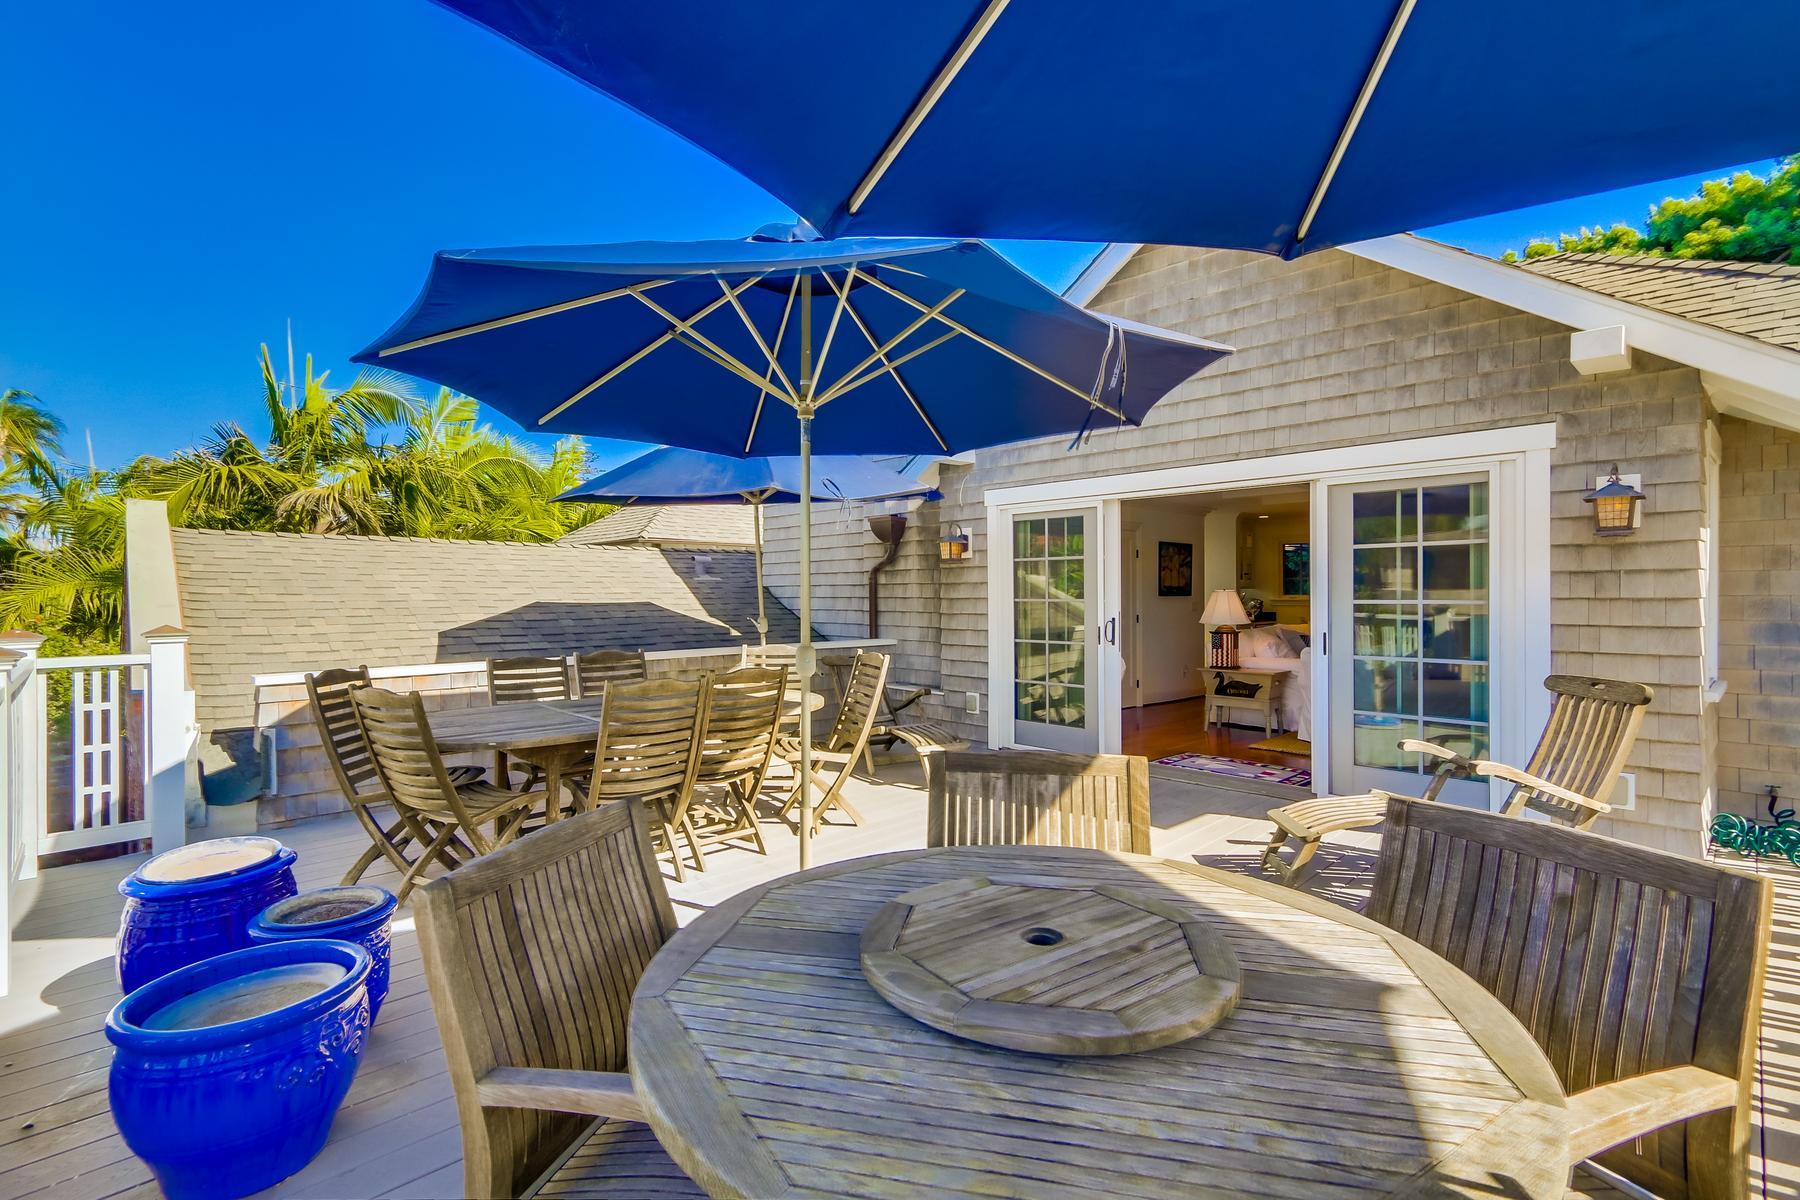 Additional photo for property listing at 1030 Loma Avenue  Coronado, California 92118 Estados Unidos